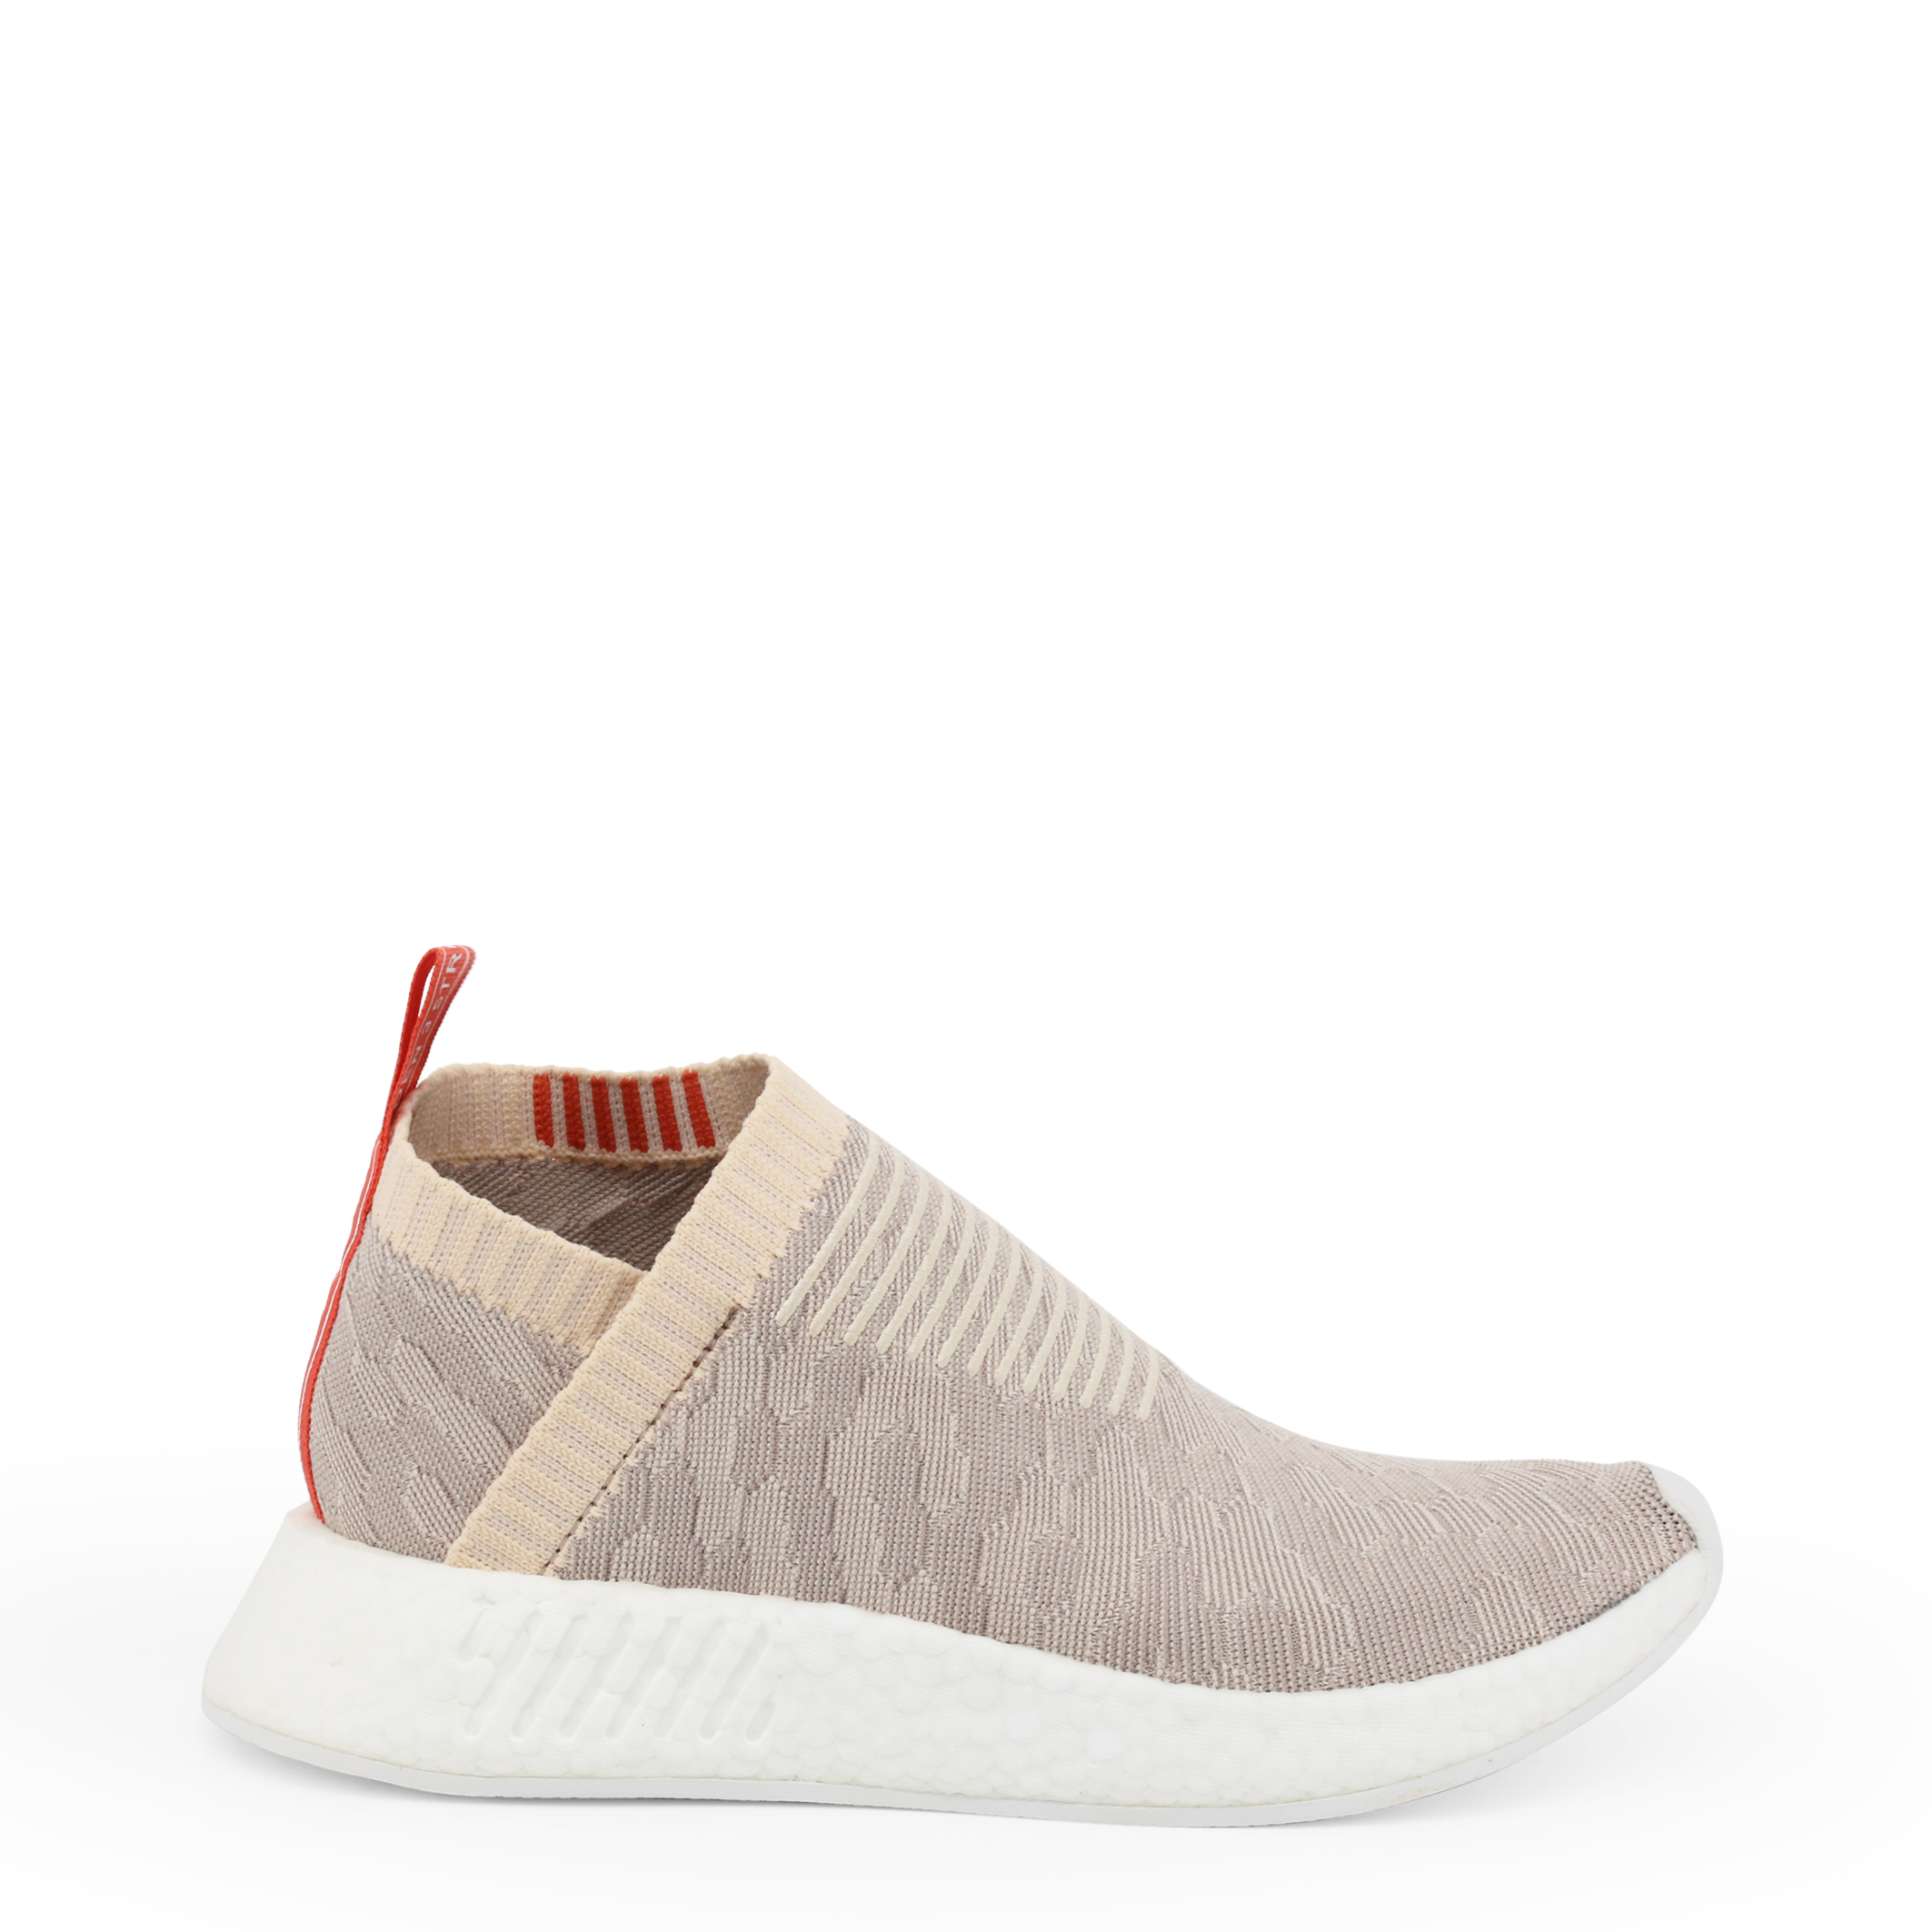 Adidas NMD CS2 W